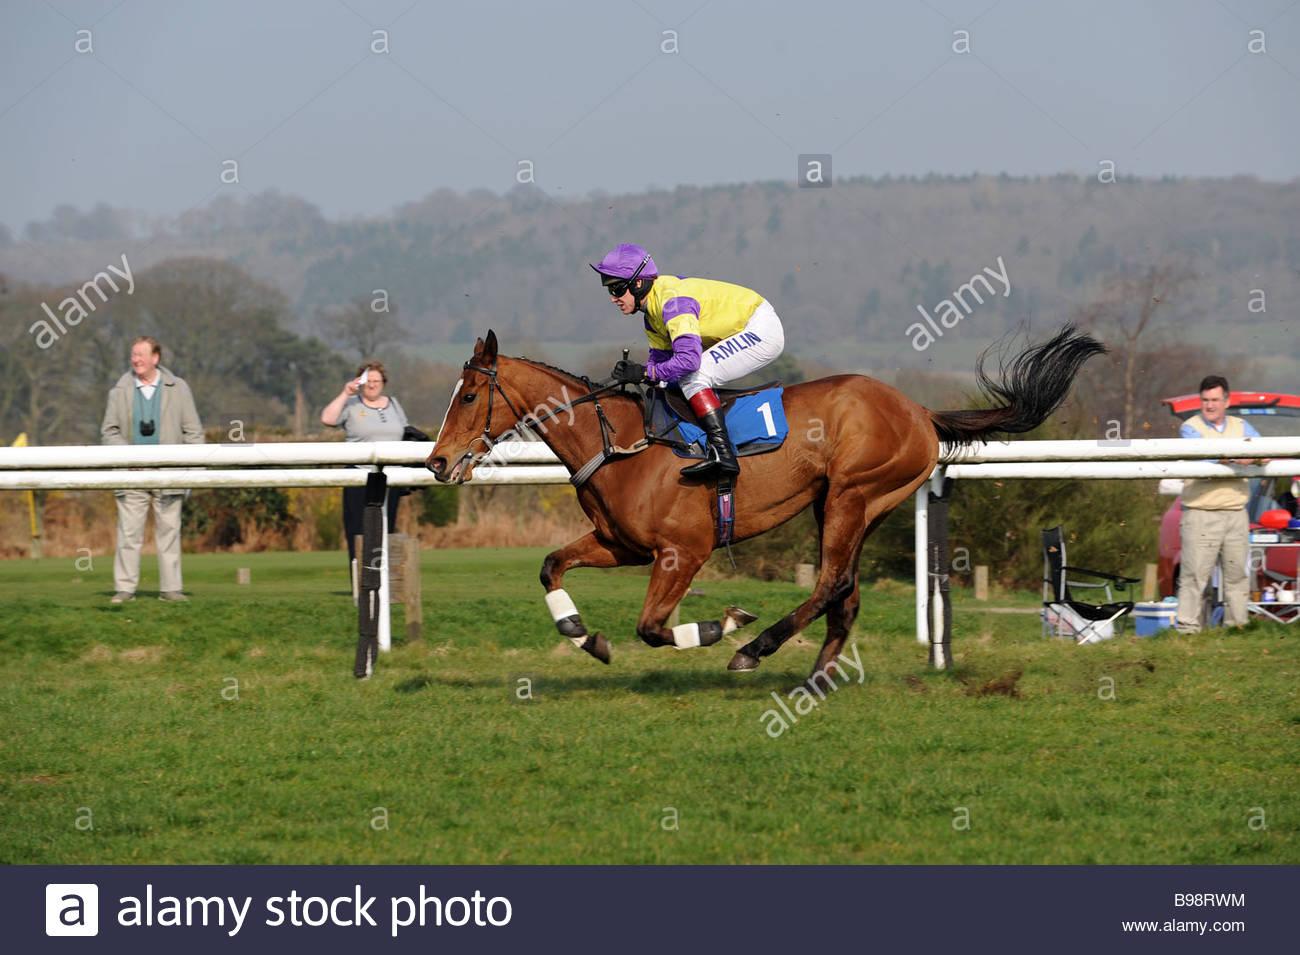 A horse and jockey at Ludlow Racecourse Shropshire Stock Photo